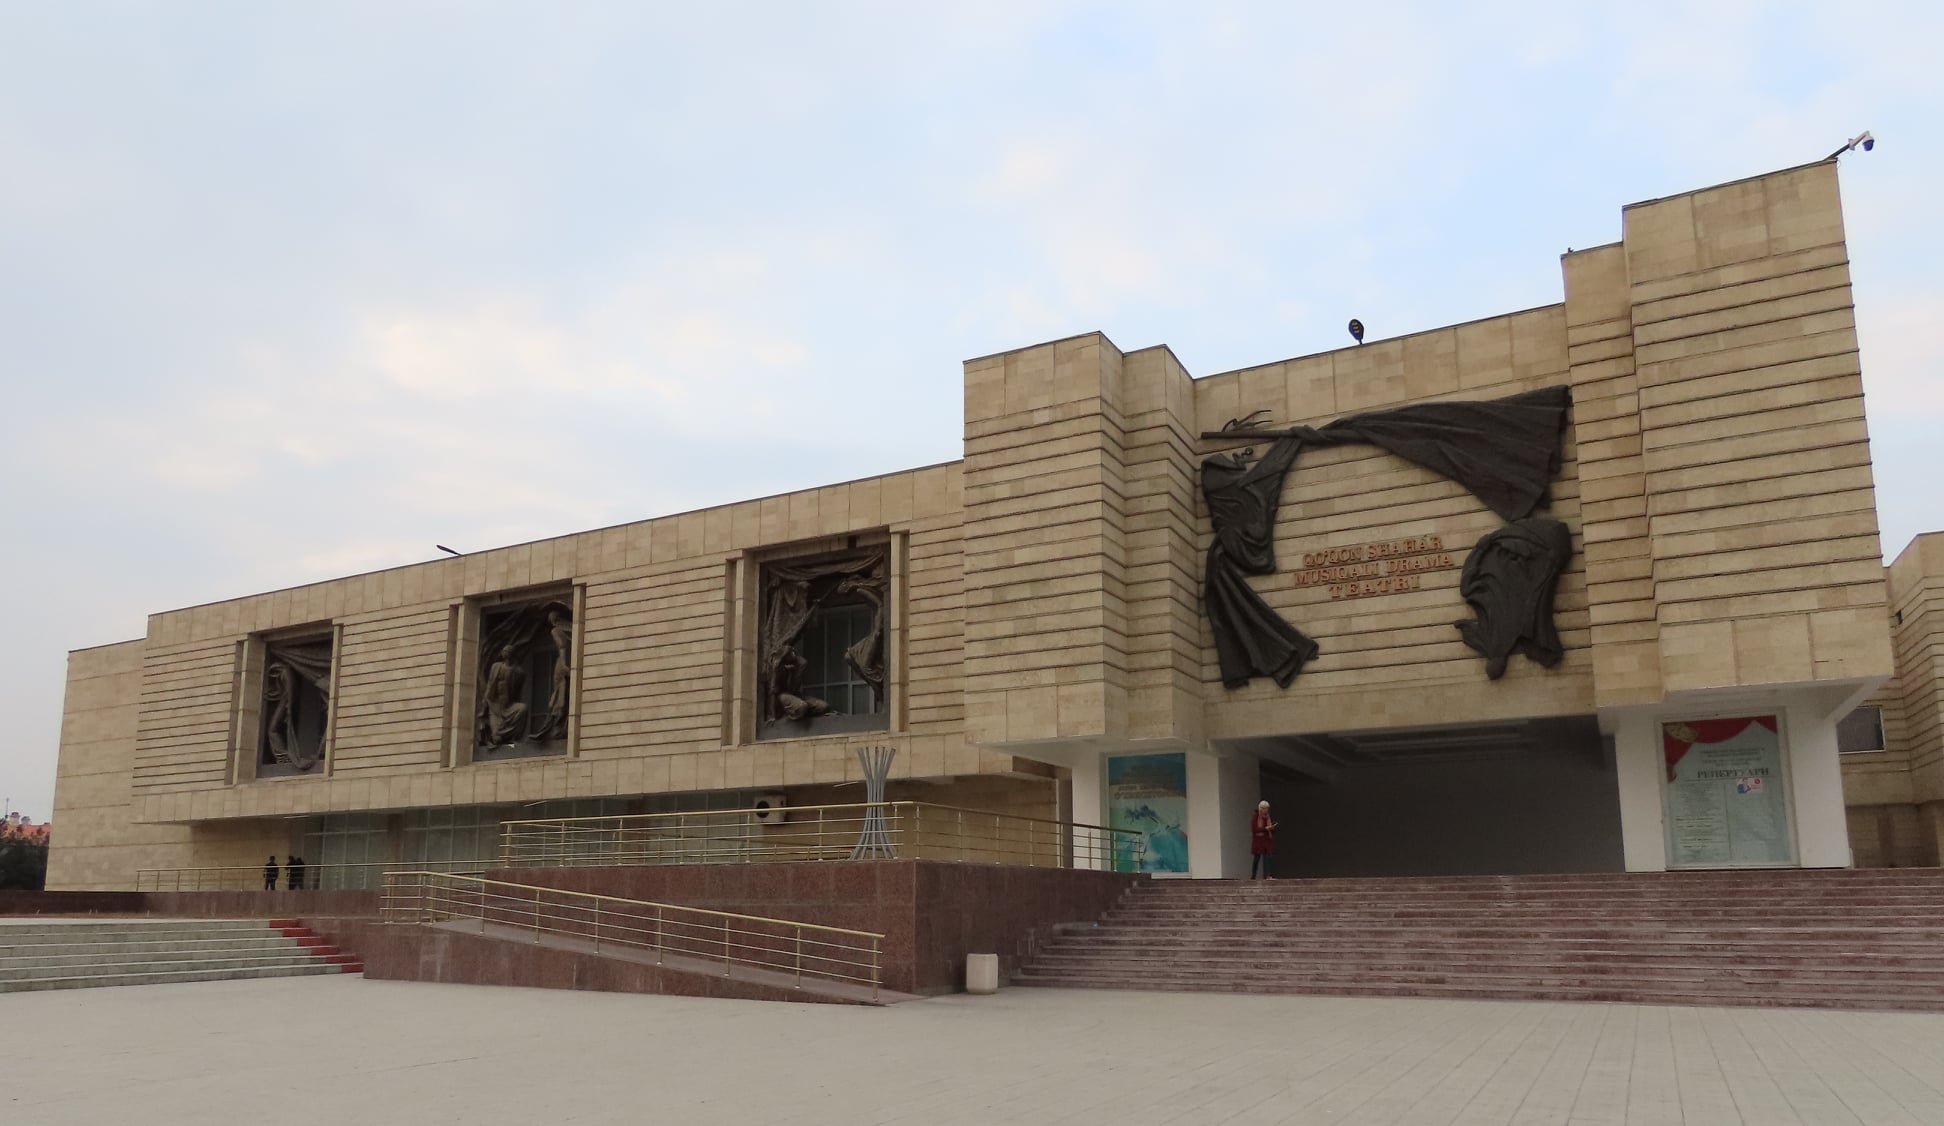 С. Сутягин. Музыкально-драматический театр в г. Коканд. фото Ф. Абдурахманова